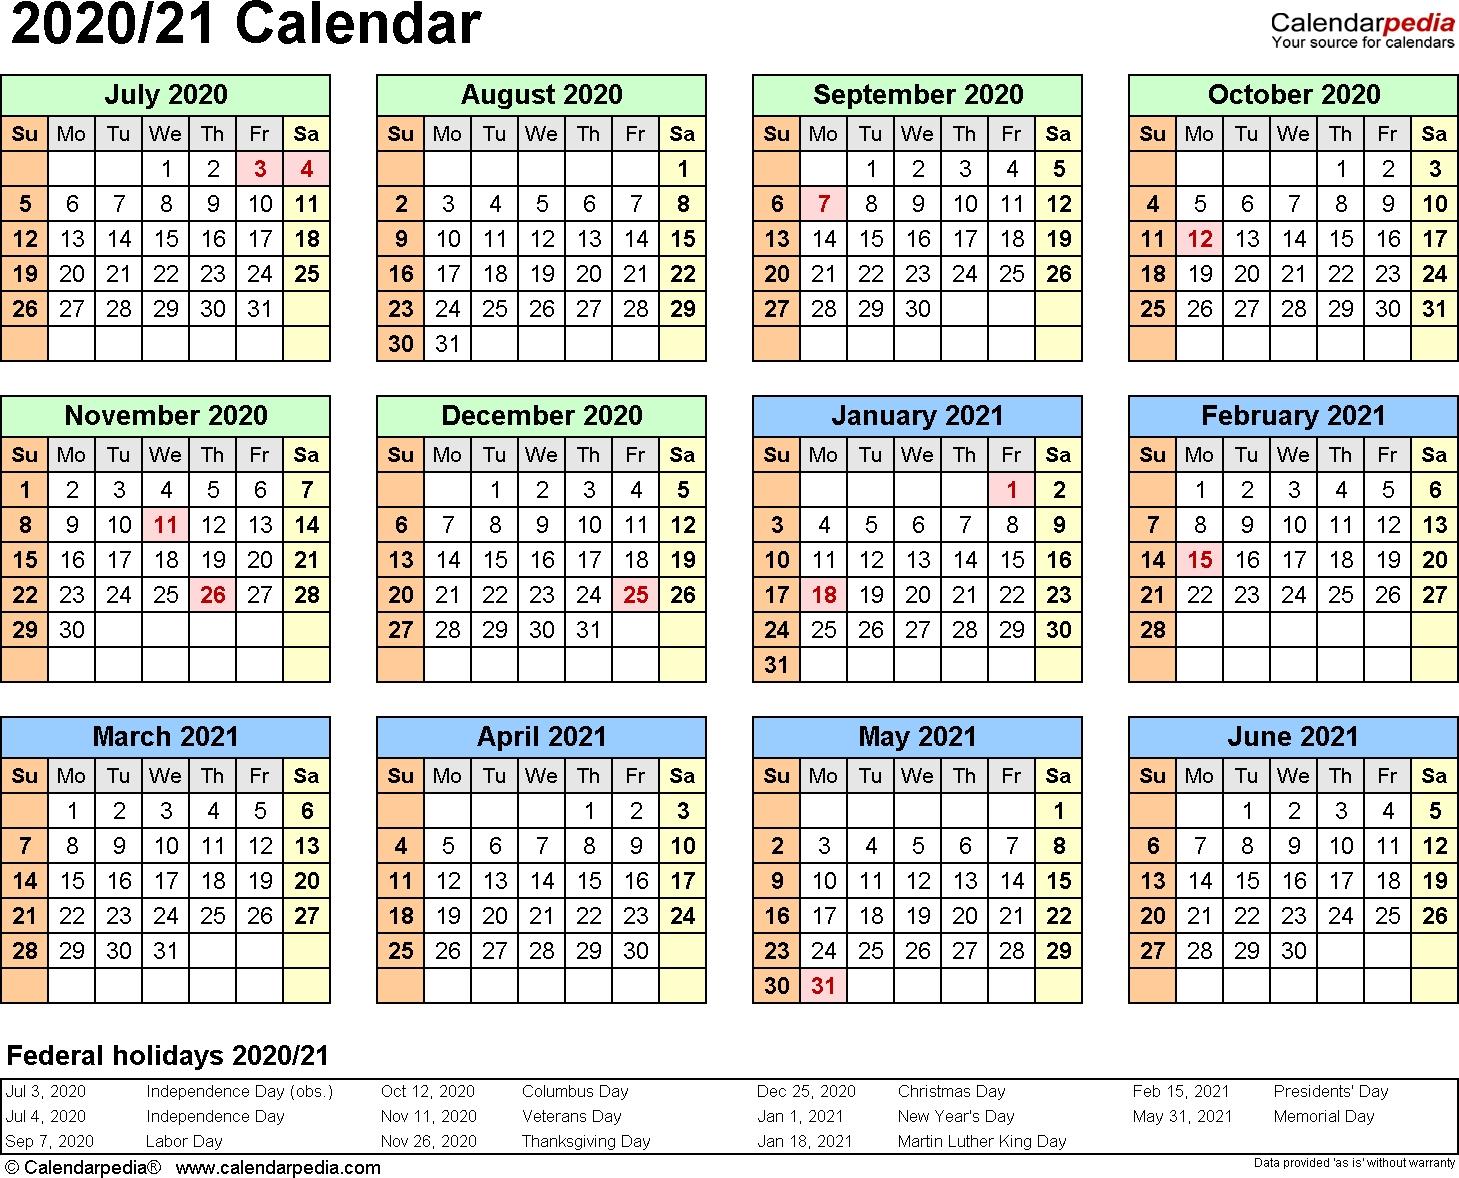 3 Year Calendar 2020 To 2021 Excel | Calendar For Planning 2021 Calendar Hk